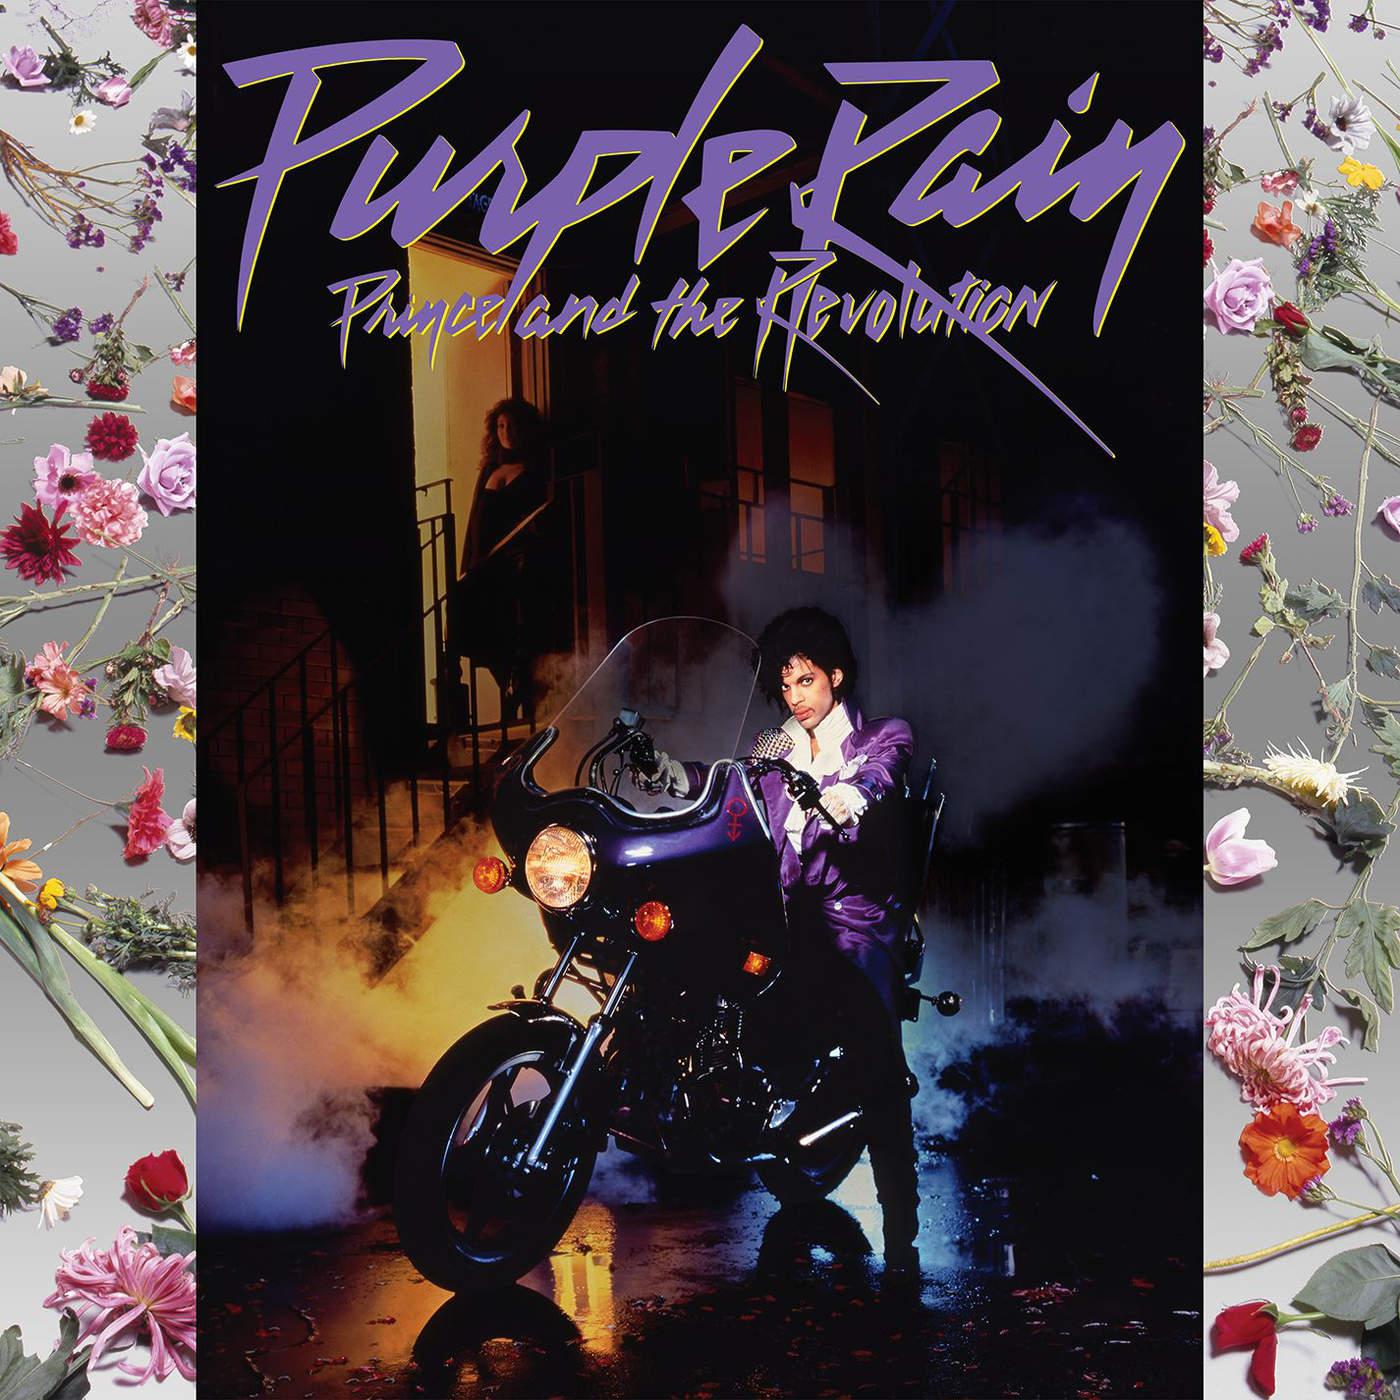 Prince & The Revolution - Our Destiny / Roadhouse Garden - Single Cover